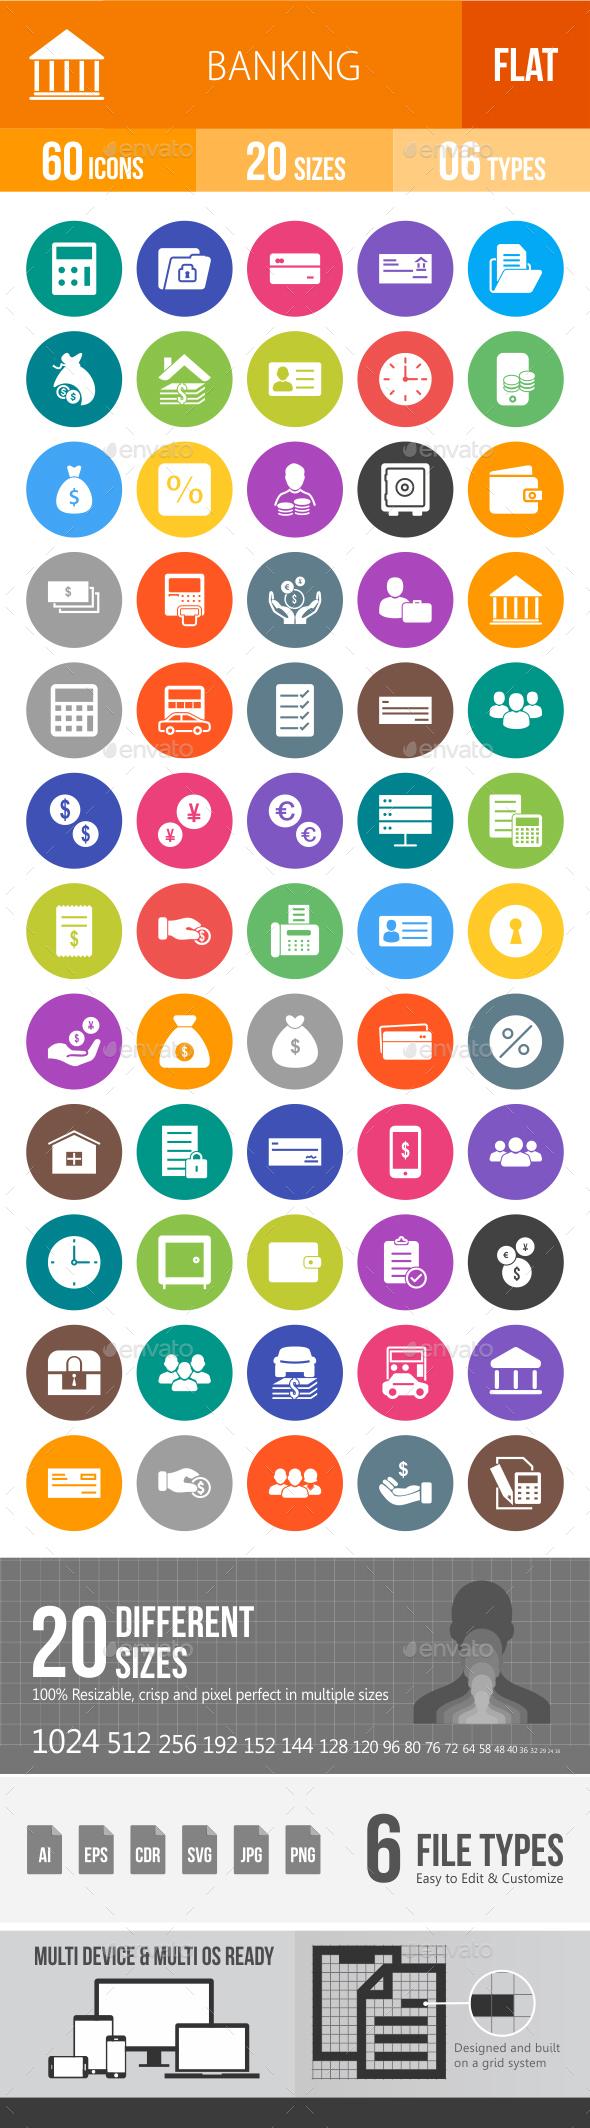 Banking Flat Round Icons - Icons